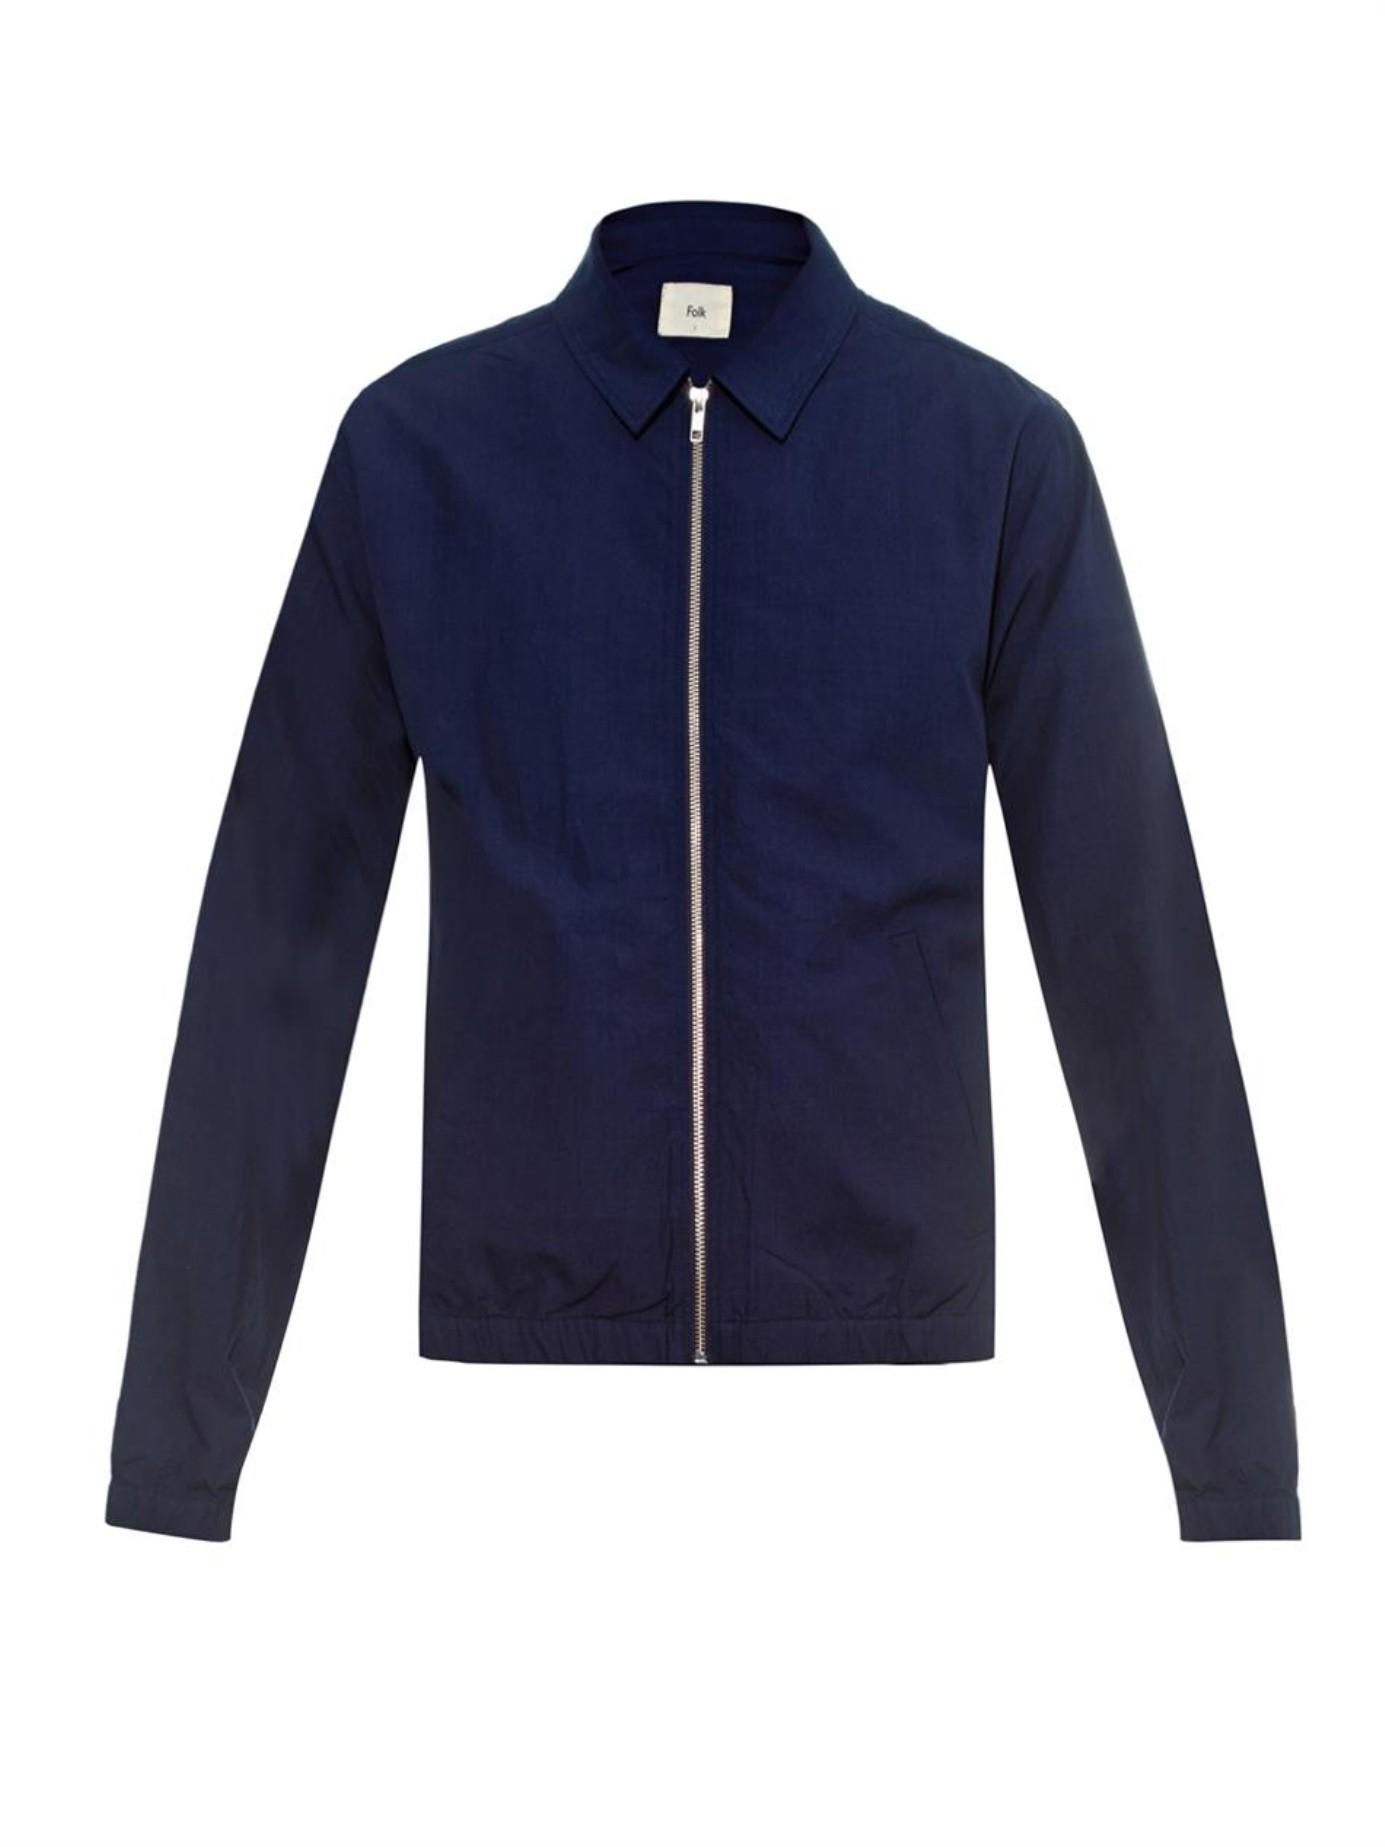 Folk Harrington Lightweight Cotton Jacket in Blue for Men | Lyst